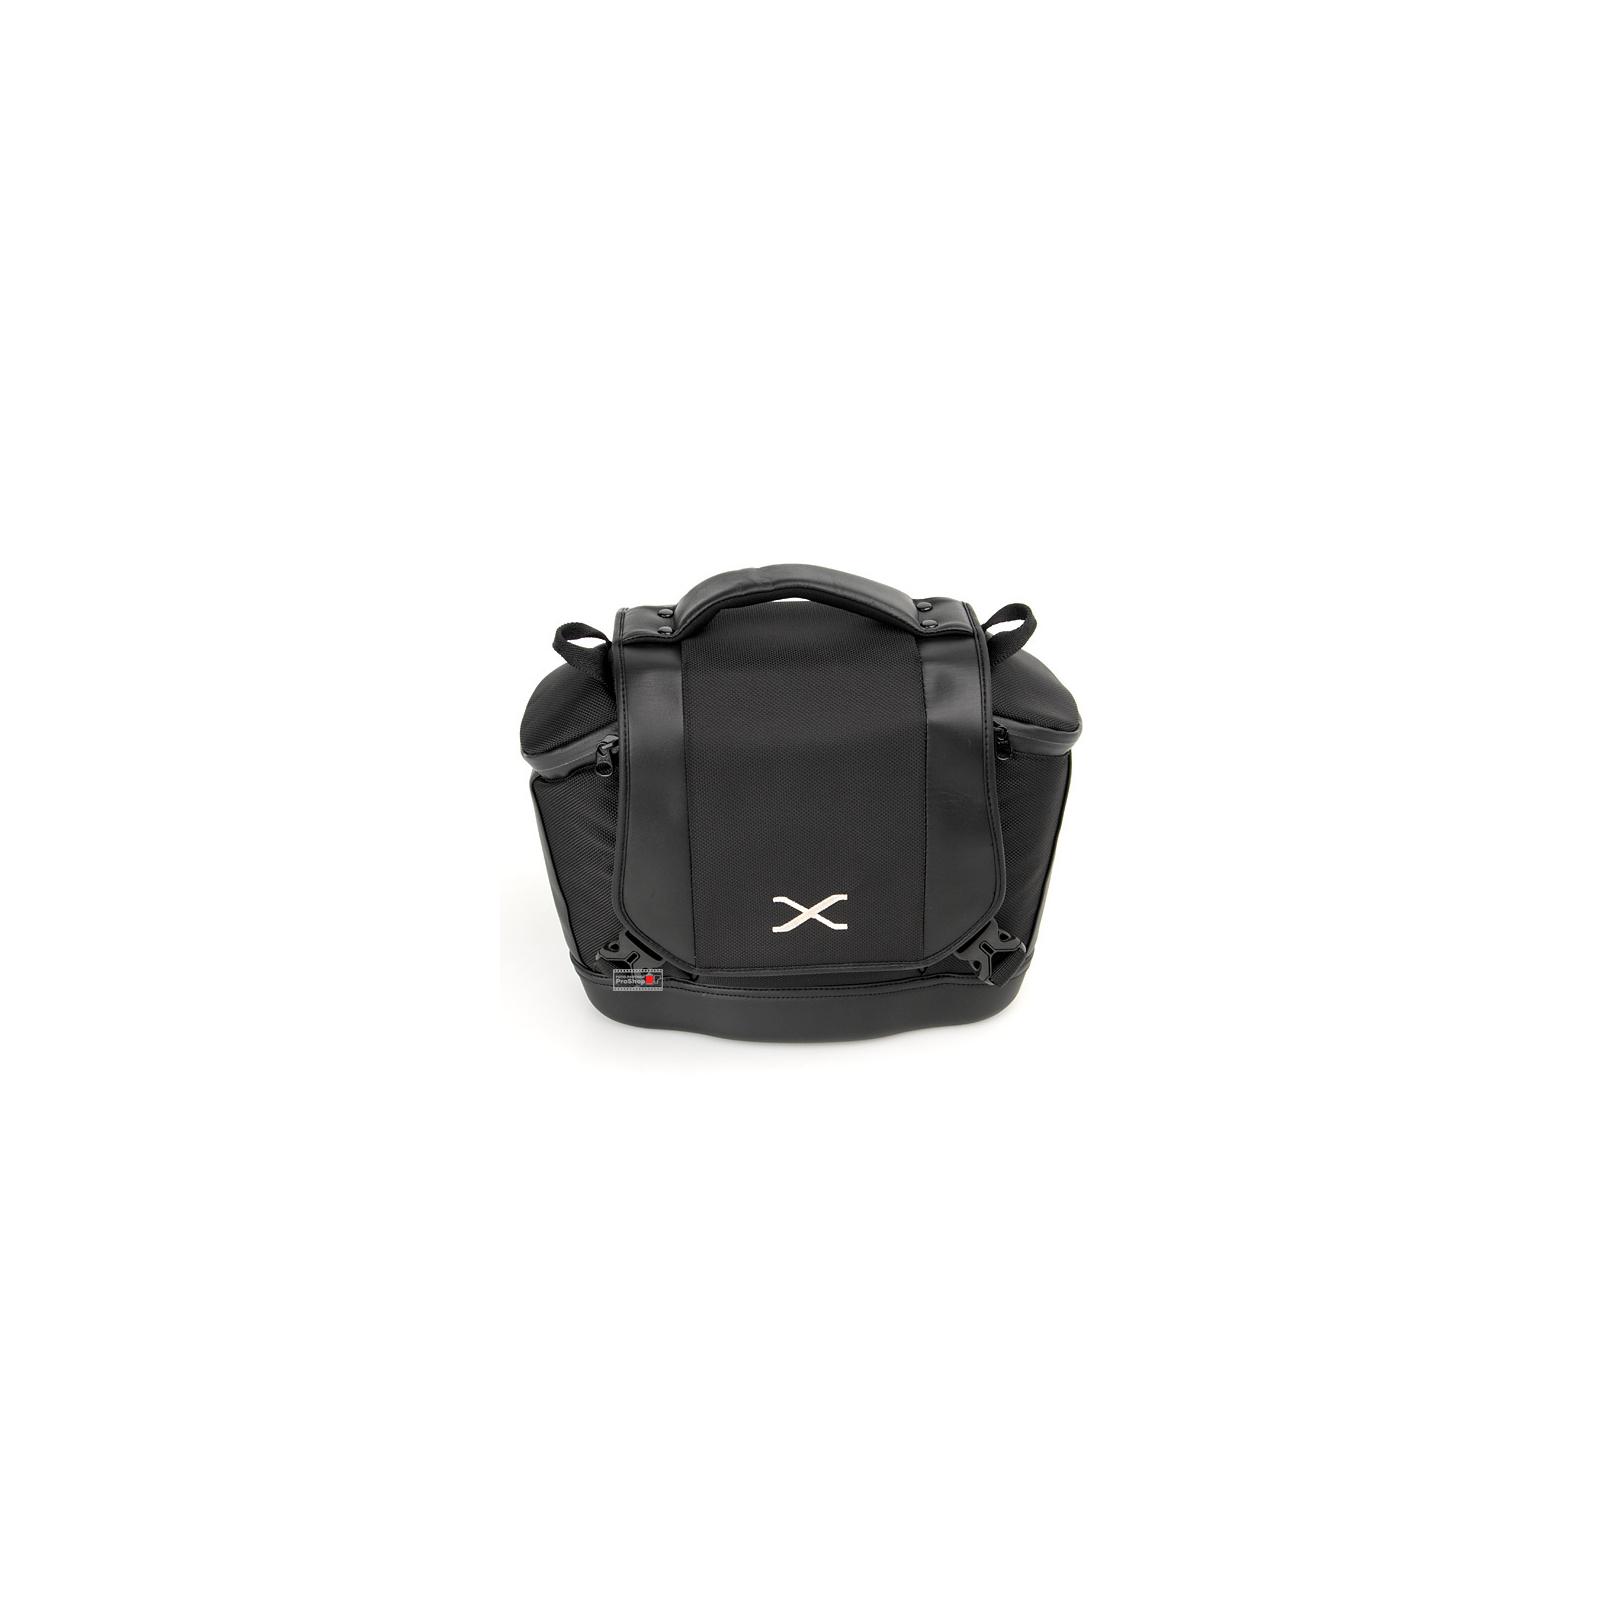 Фото-сумка Fujifilm SC-X black (04004455) изображение 3